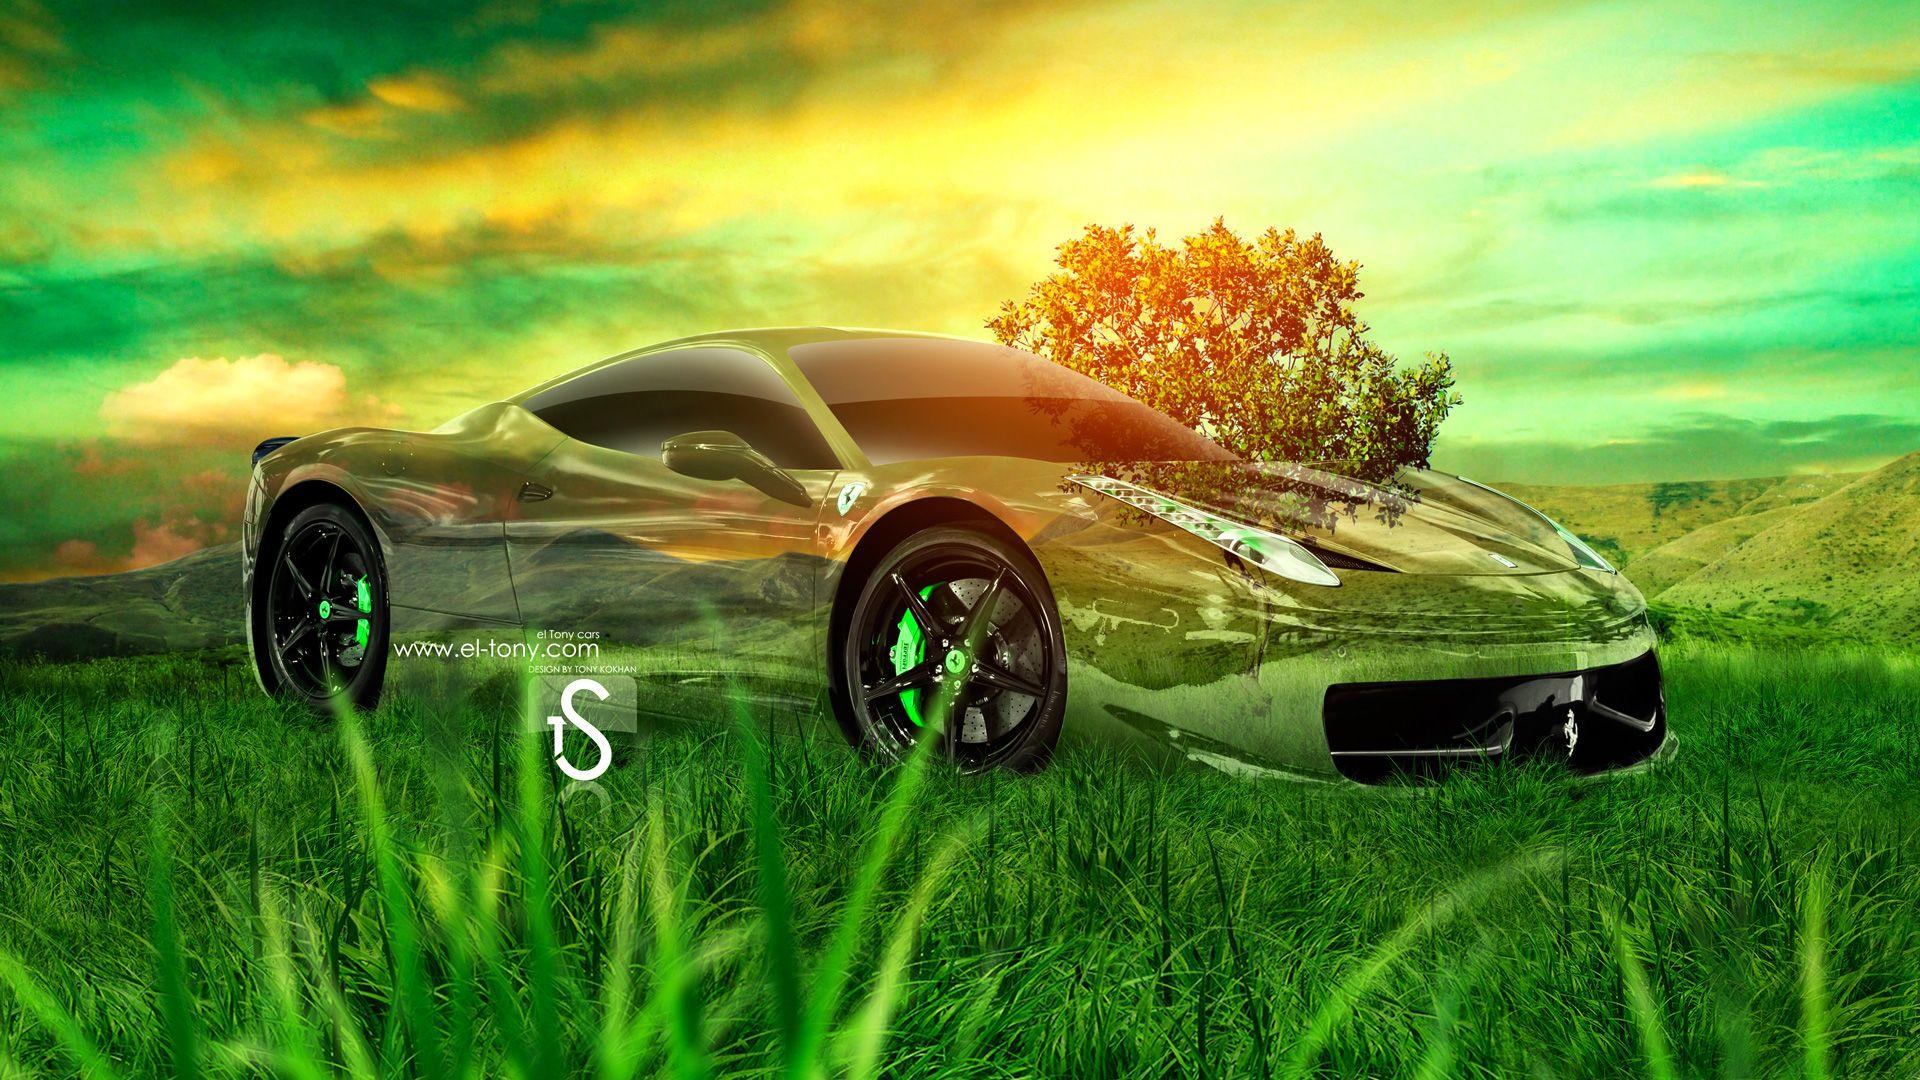 Charming Black Sports Car Wallpaper   Google Search | Automobiles | Pinterest |  Ferrari And Wallpaper